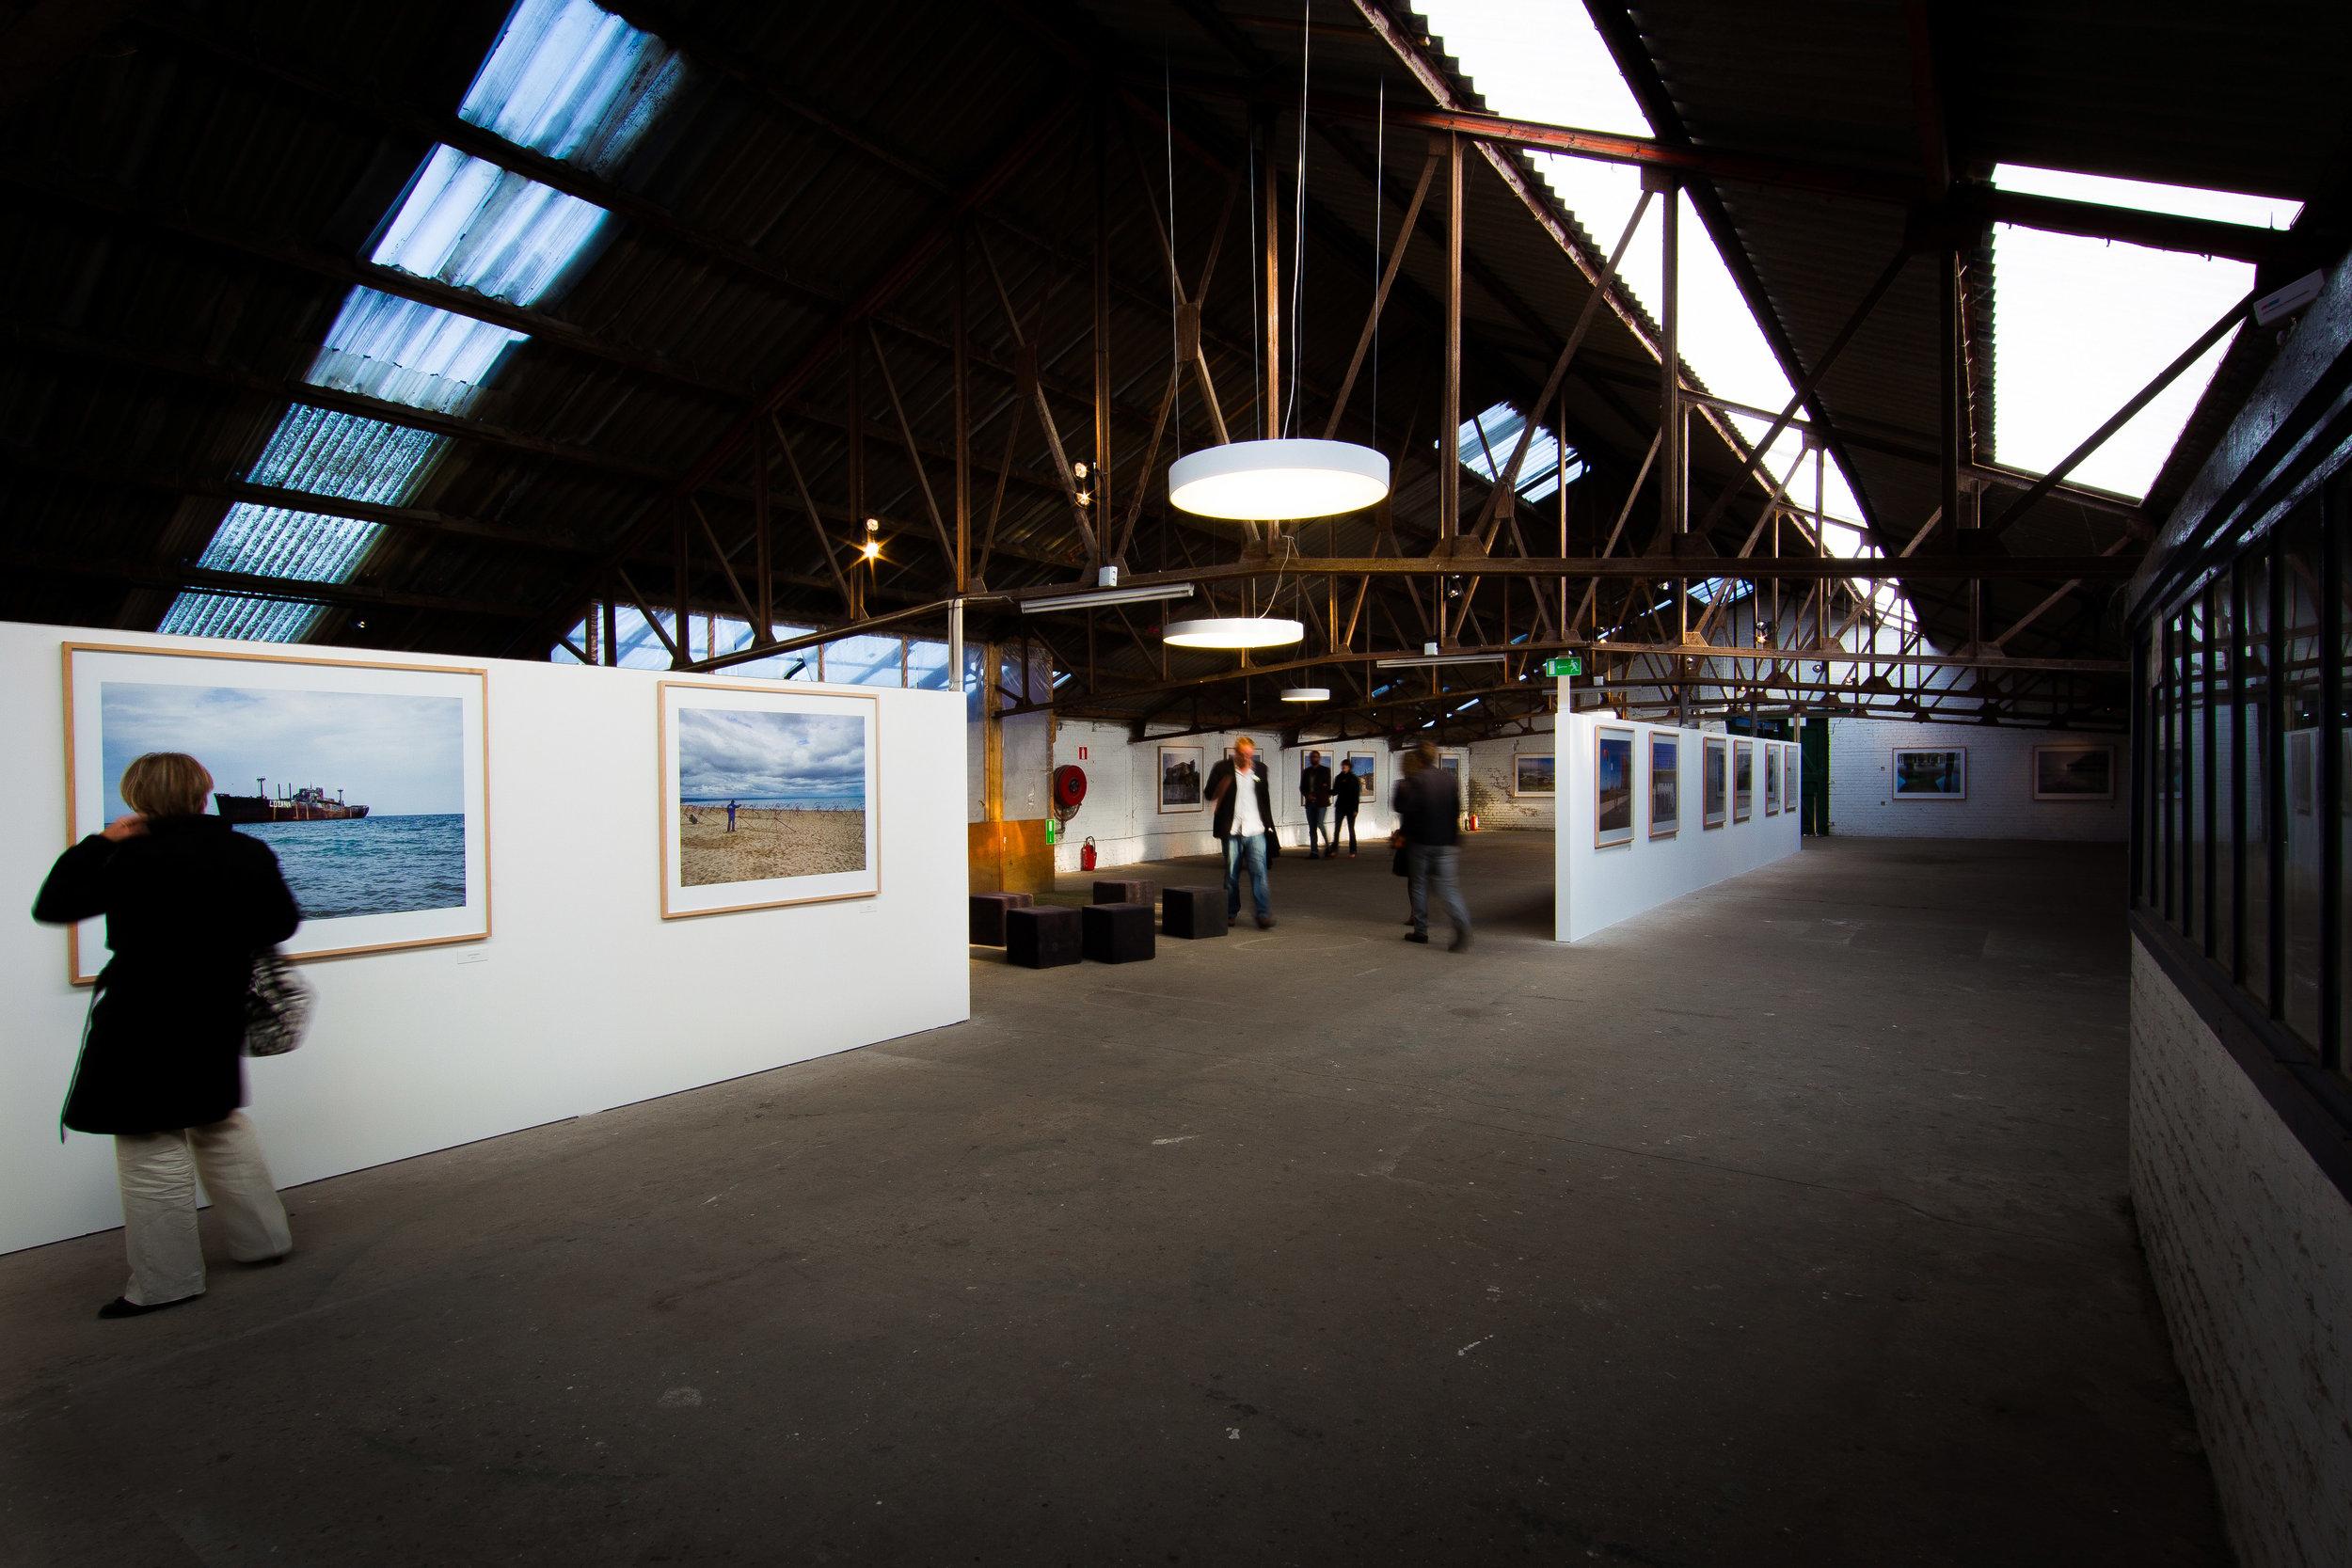 Tentoonstelling Carl De Keyzer - Oostende 2012 - Fotografie Valerie Clarysse - 22.jpg